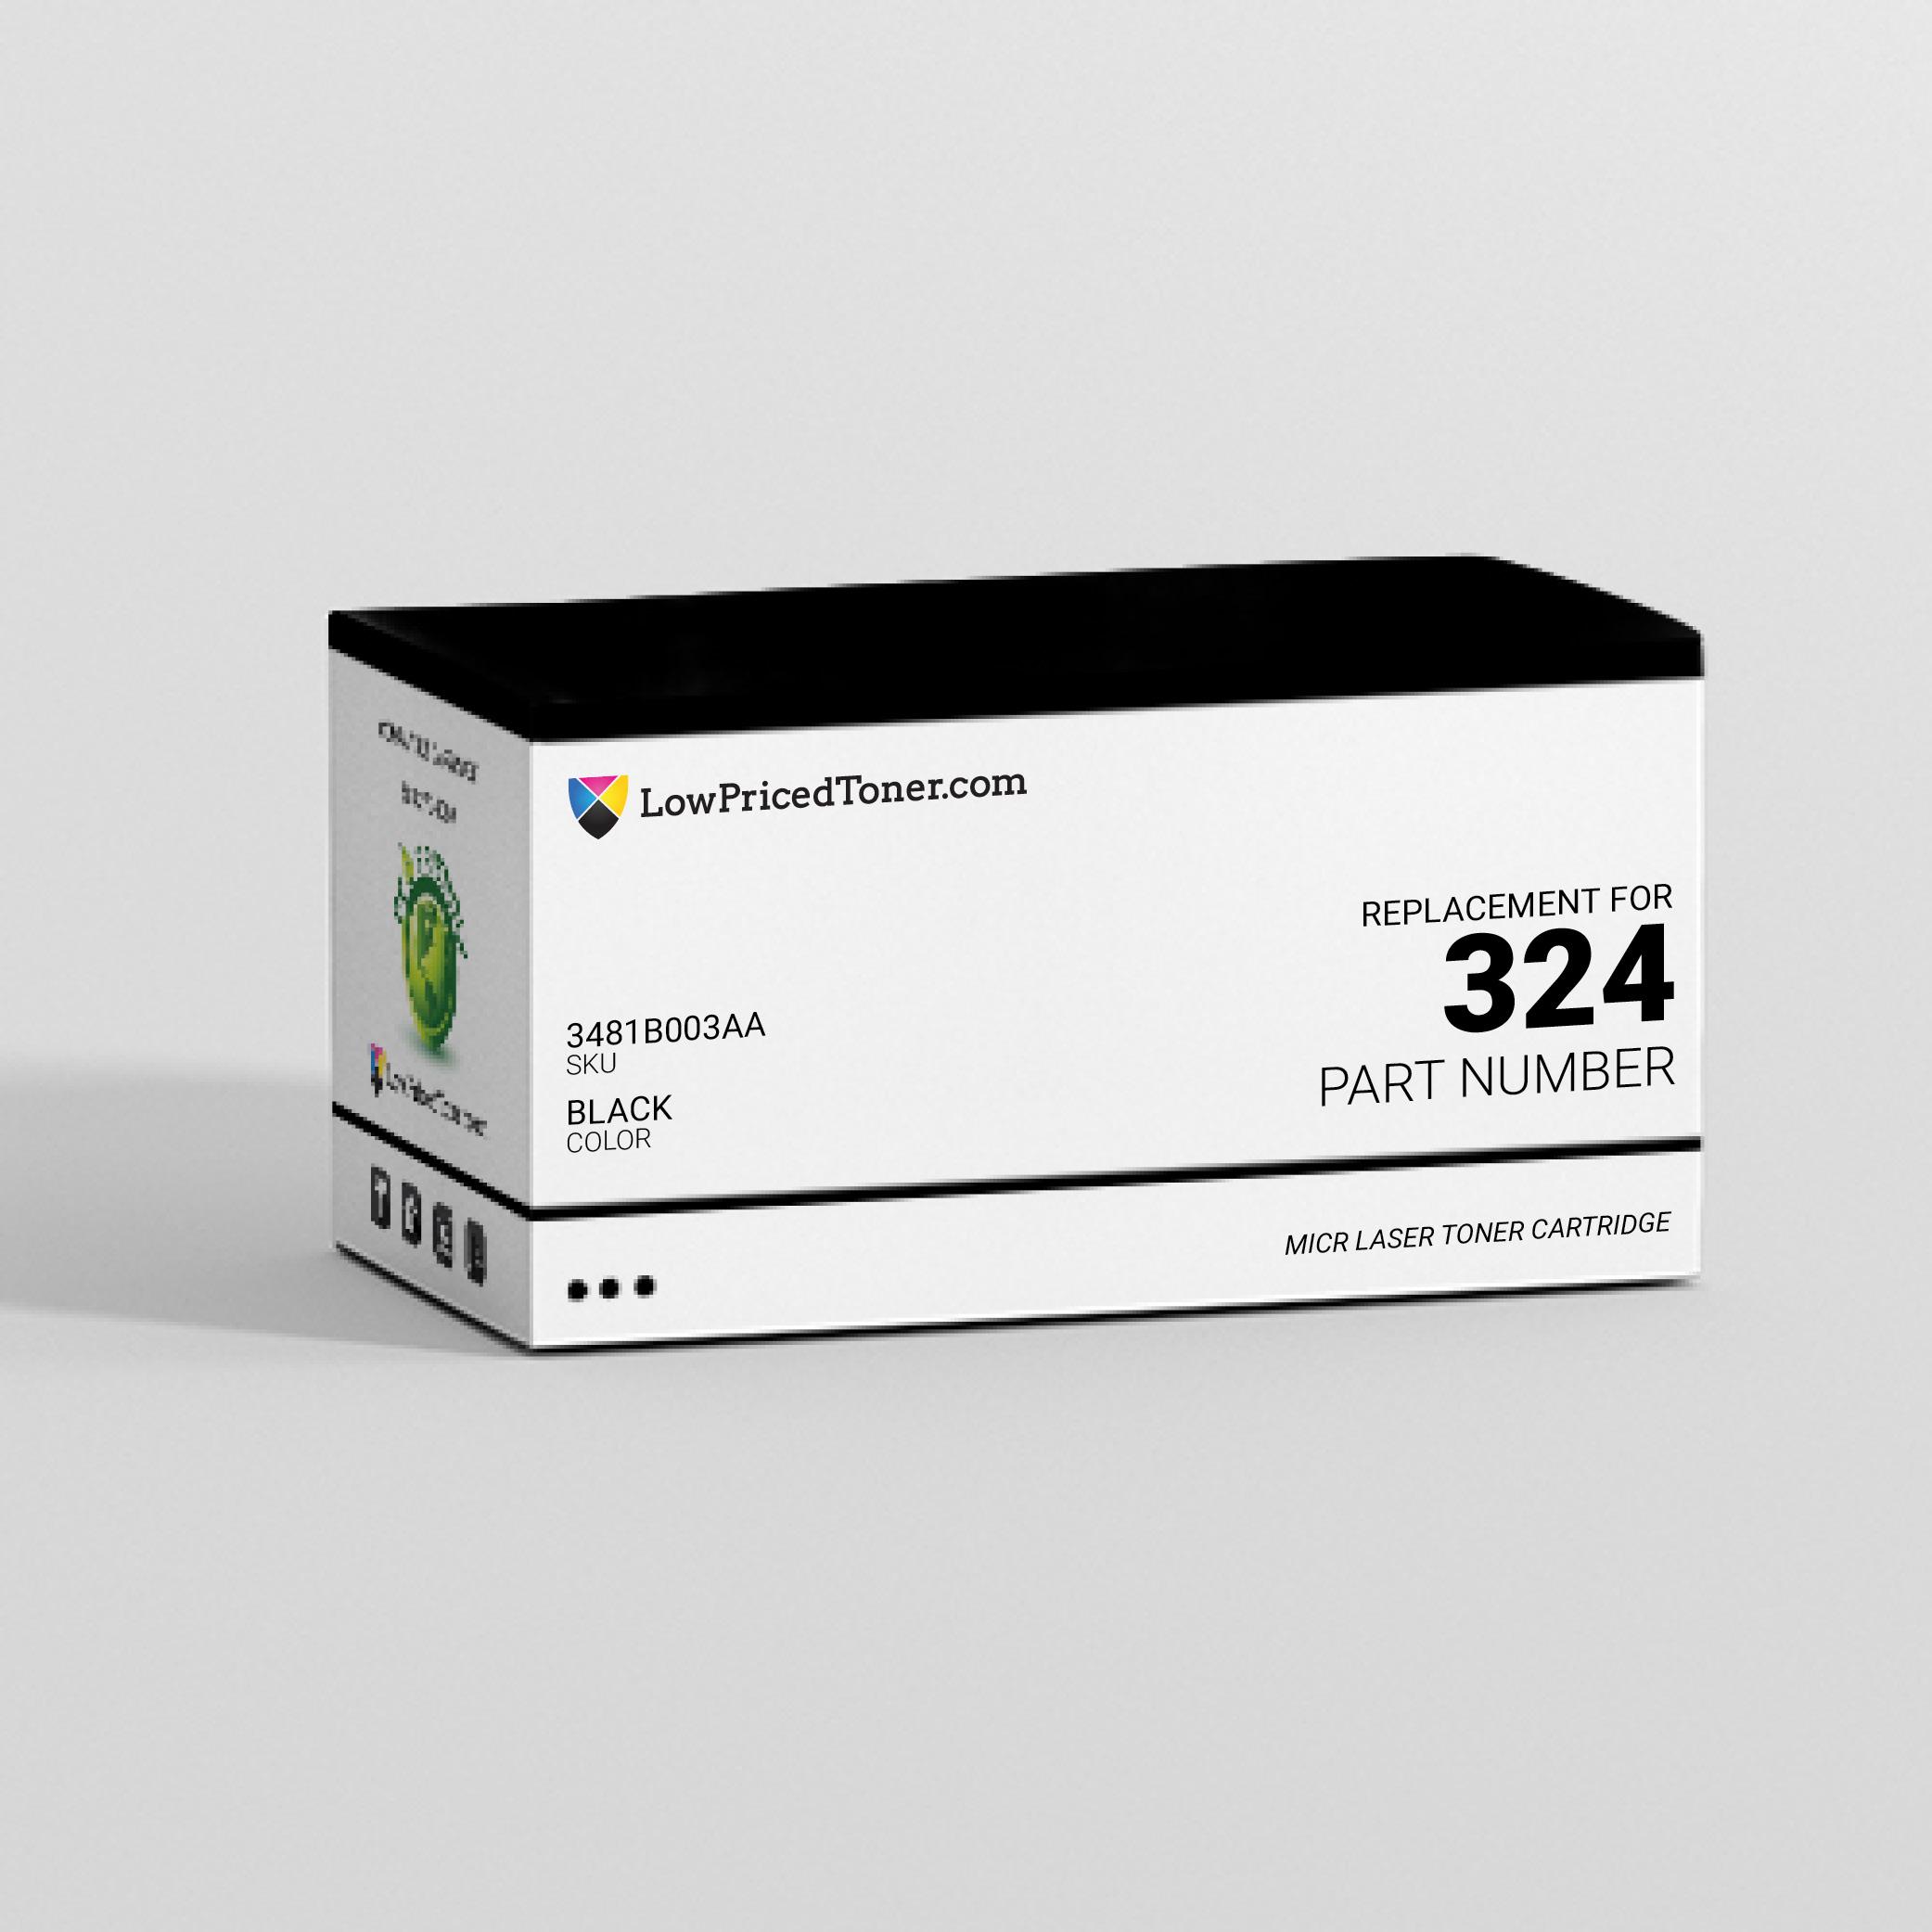 Canon 3481B003AA 324 Remanufactured Black MICR Laser Toner Cartridge